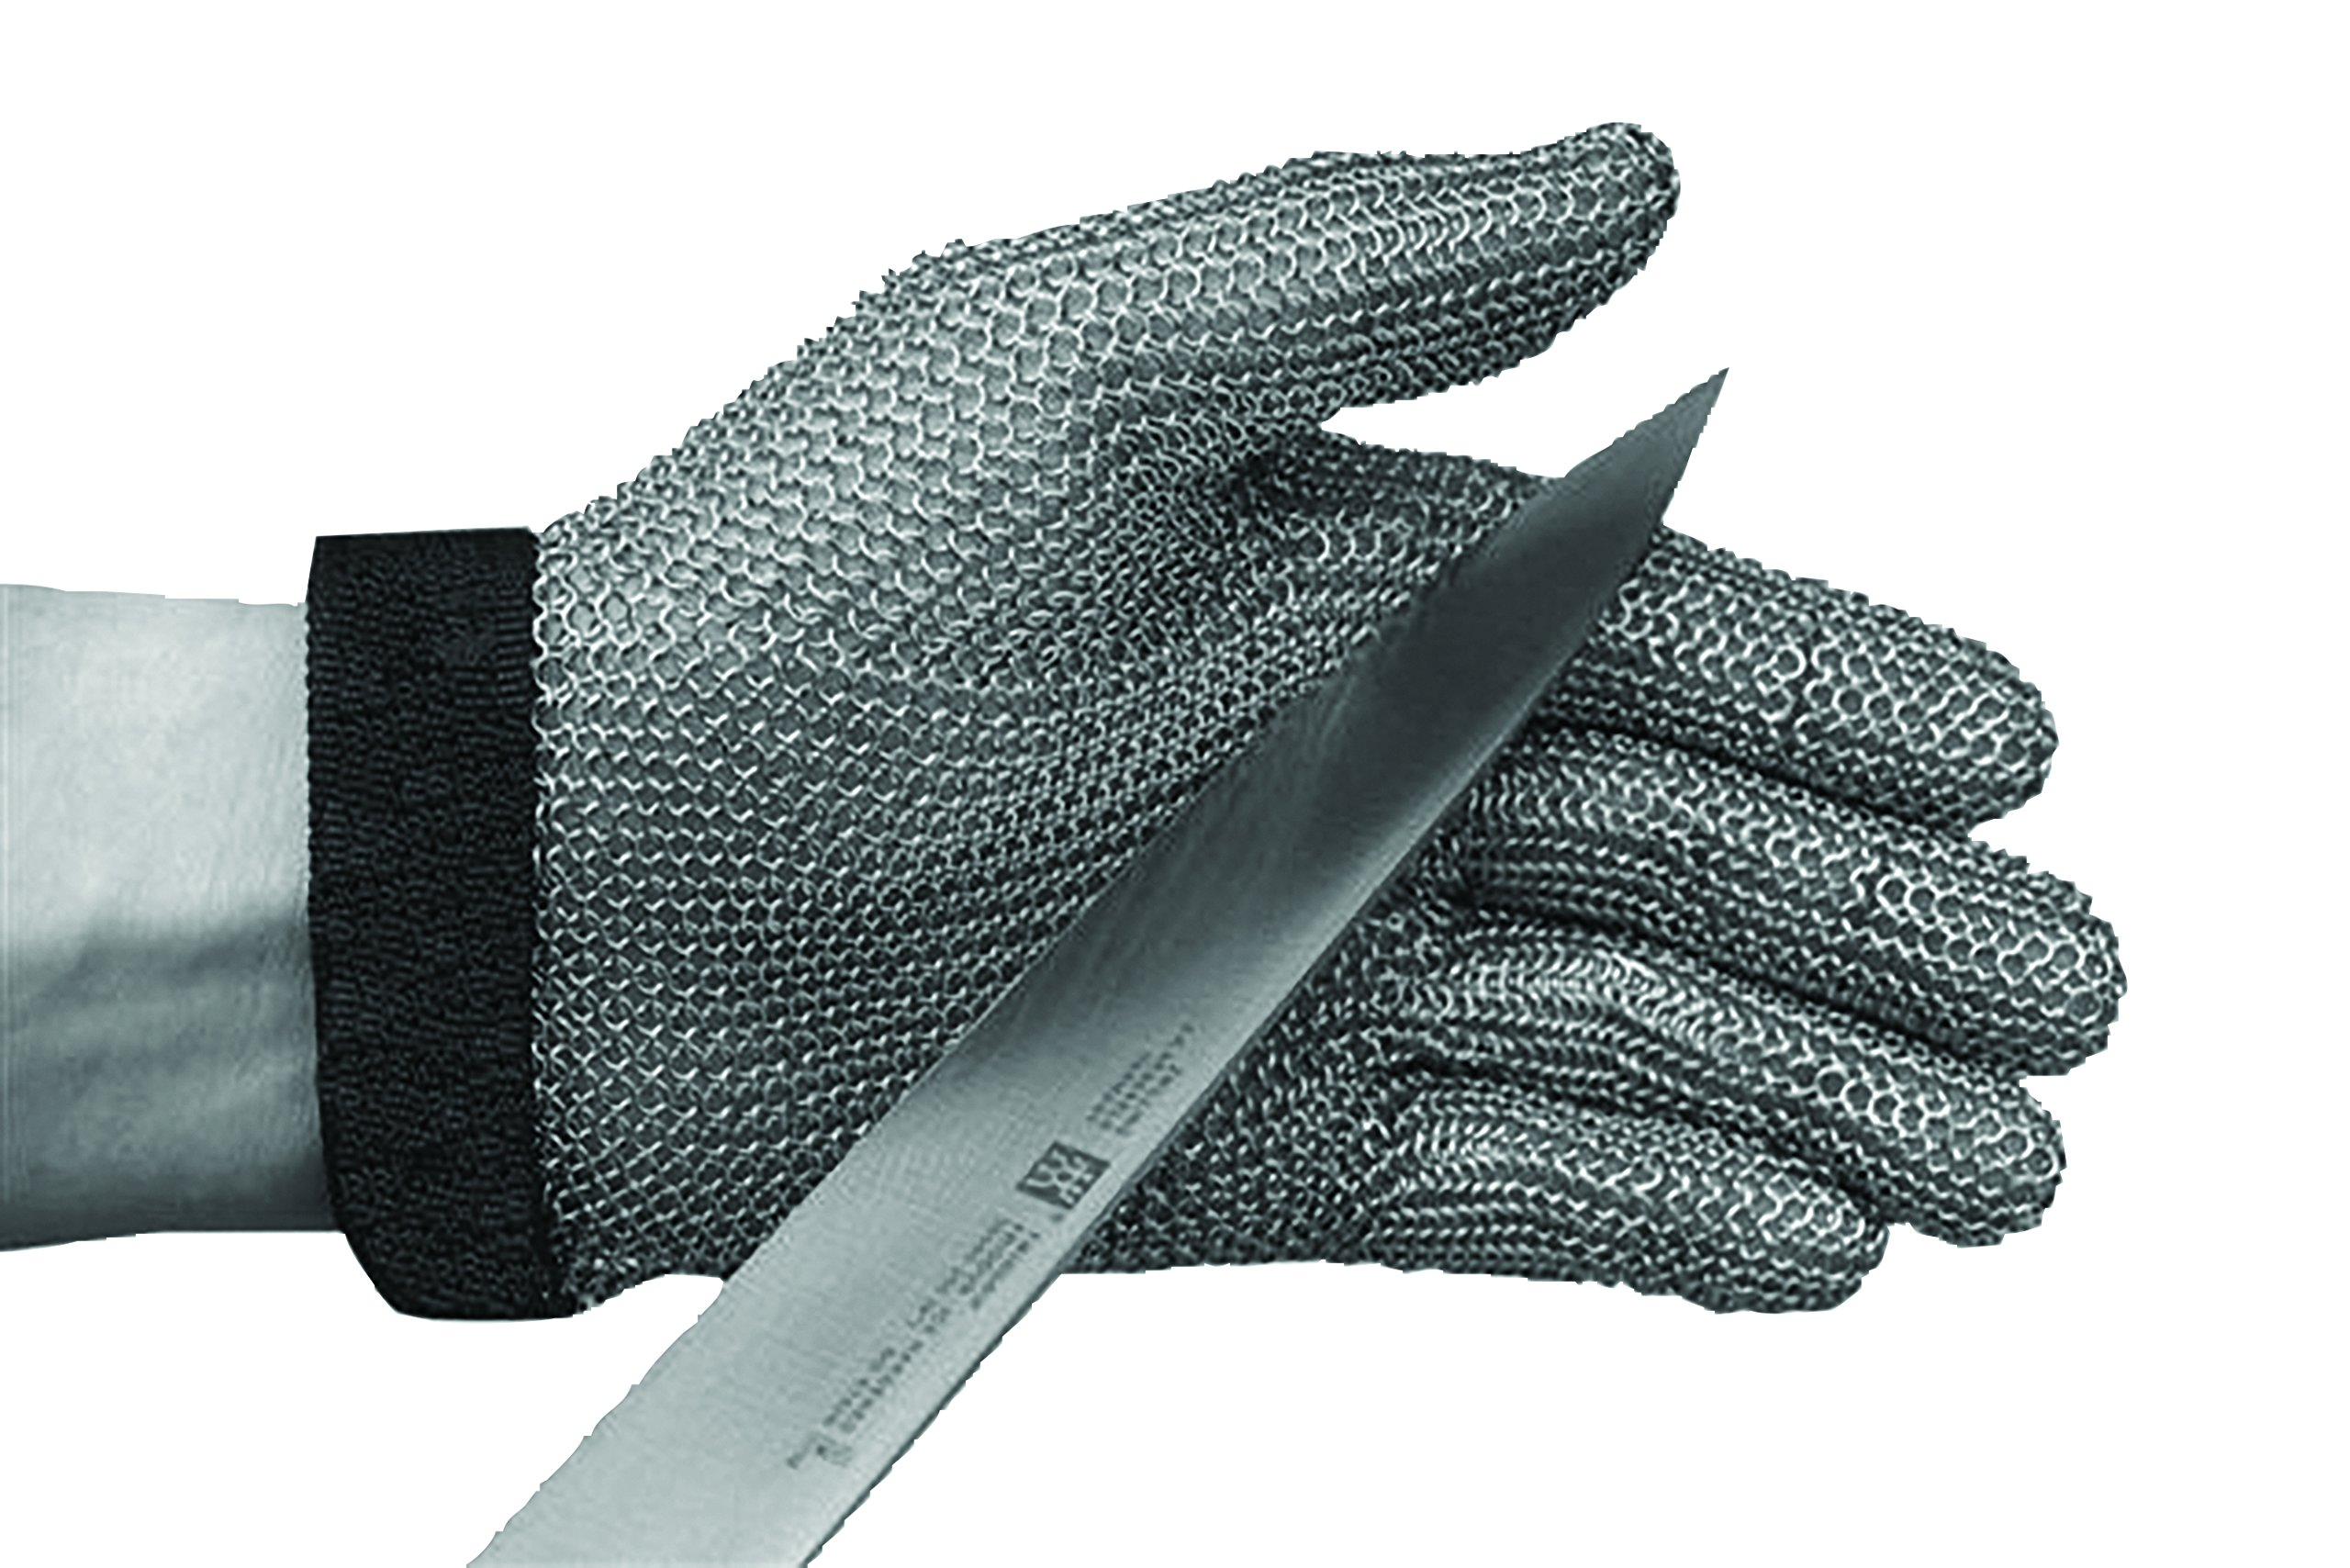 San Jamar MGA515L Ambidextroius Cut Protection Glove, Stainless Steel Mesh, Large